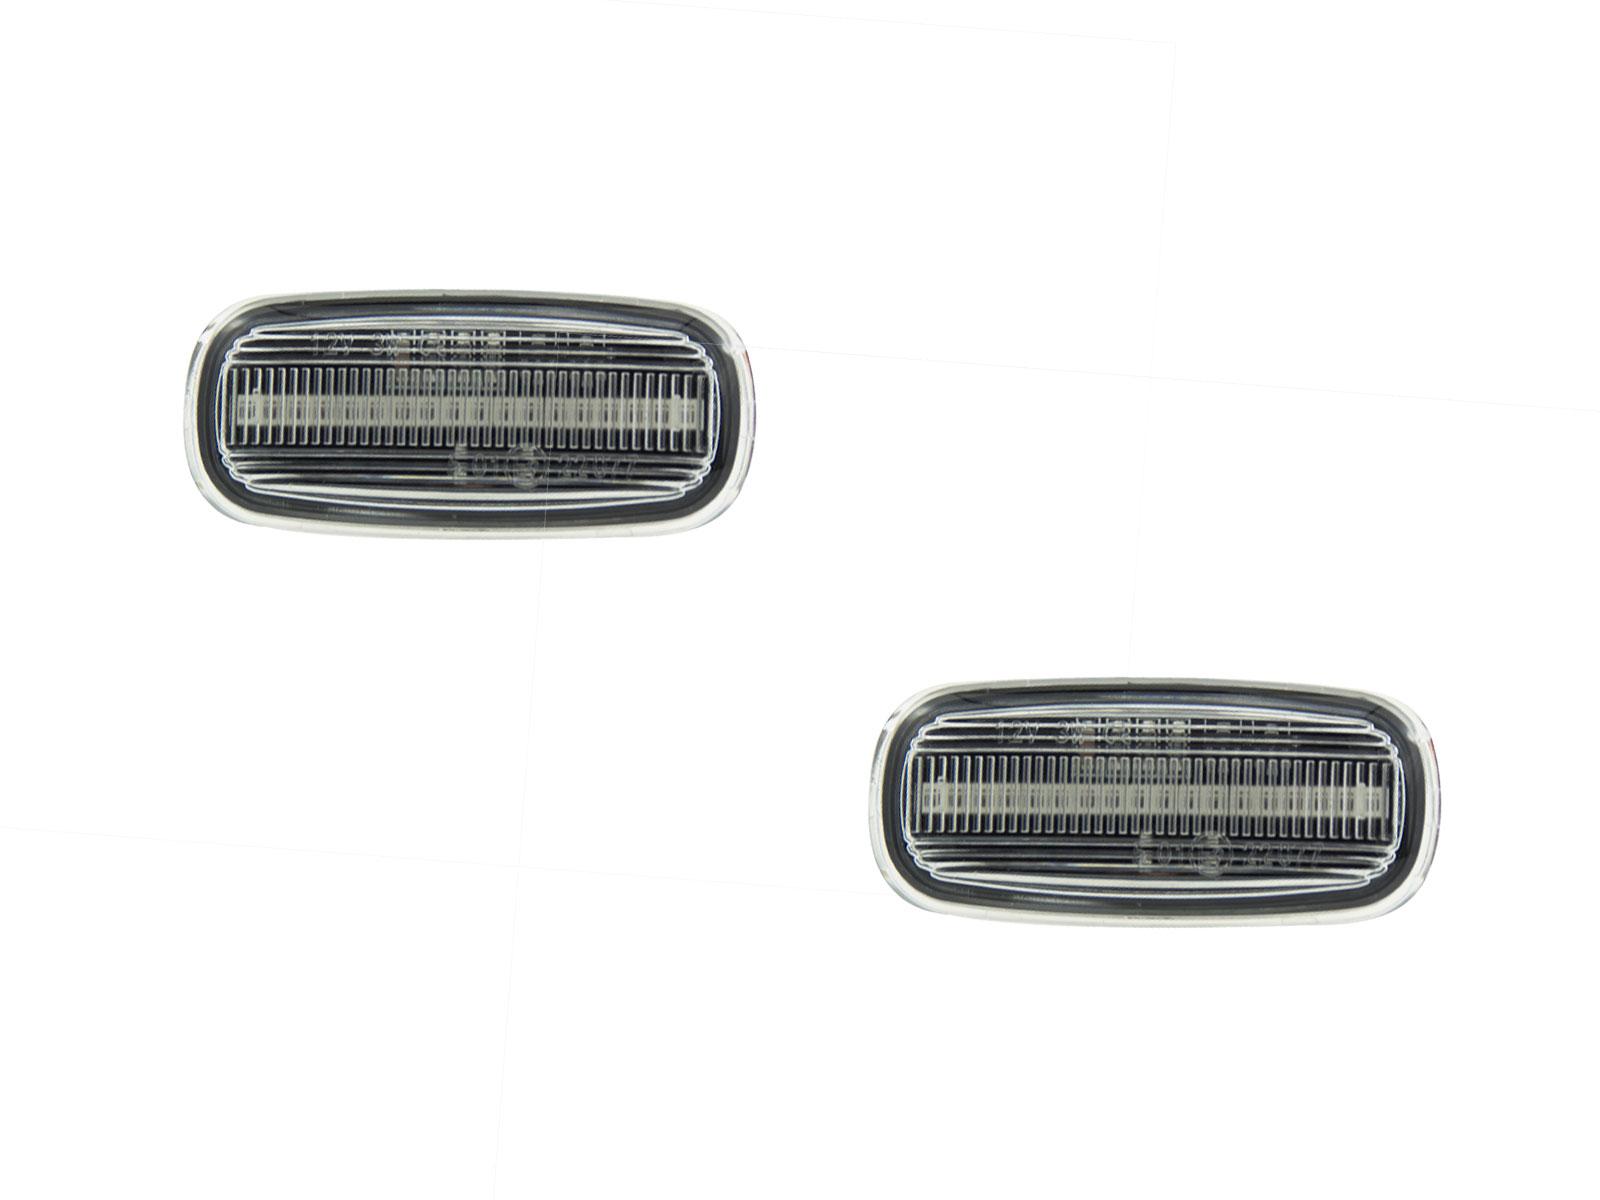 A6 C5 A8 D2 Facelift//TT 8N mit E-Pr/üfzeichen A4 B5 Facelift LETRONIX LED Seitenblinker Blinker Module Smoke Schwarz A2 8Z A3 8L Facelift